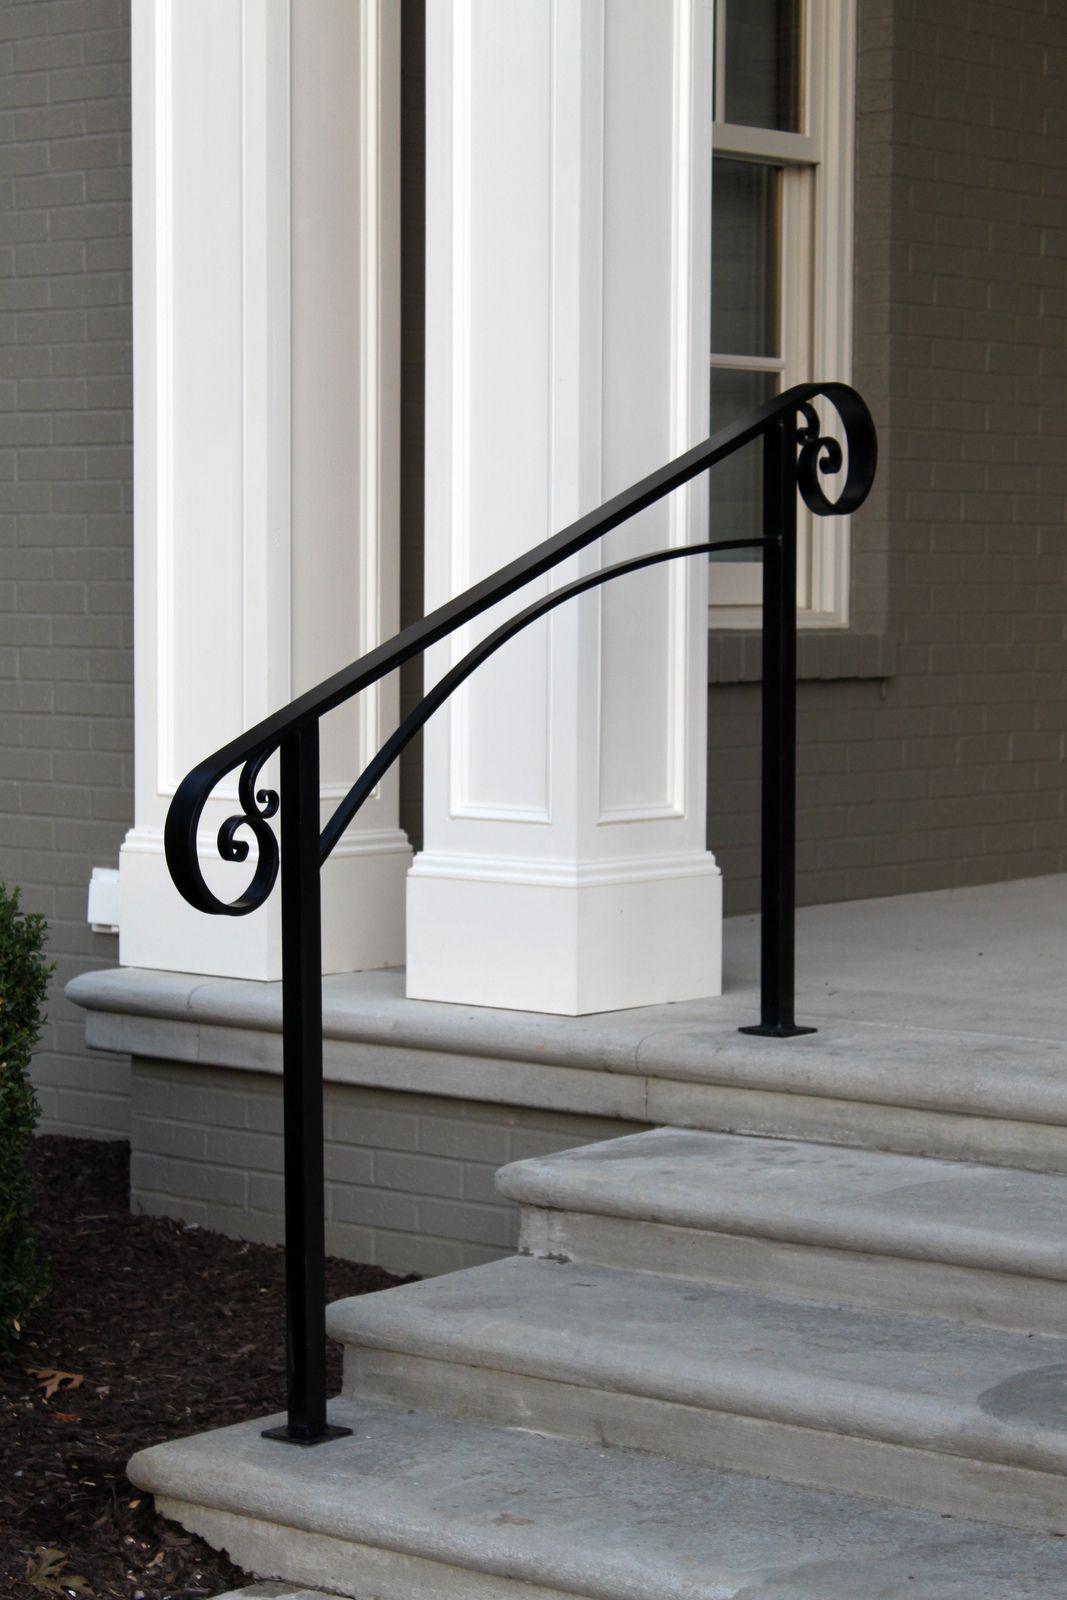 Installation 9 9 13 Powder Coating In Matte Black Over | Aluminum Handrails For Steps